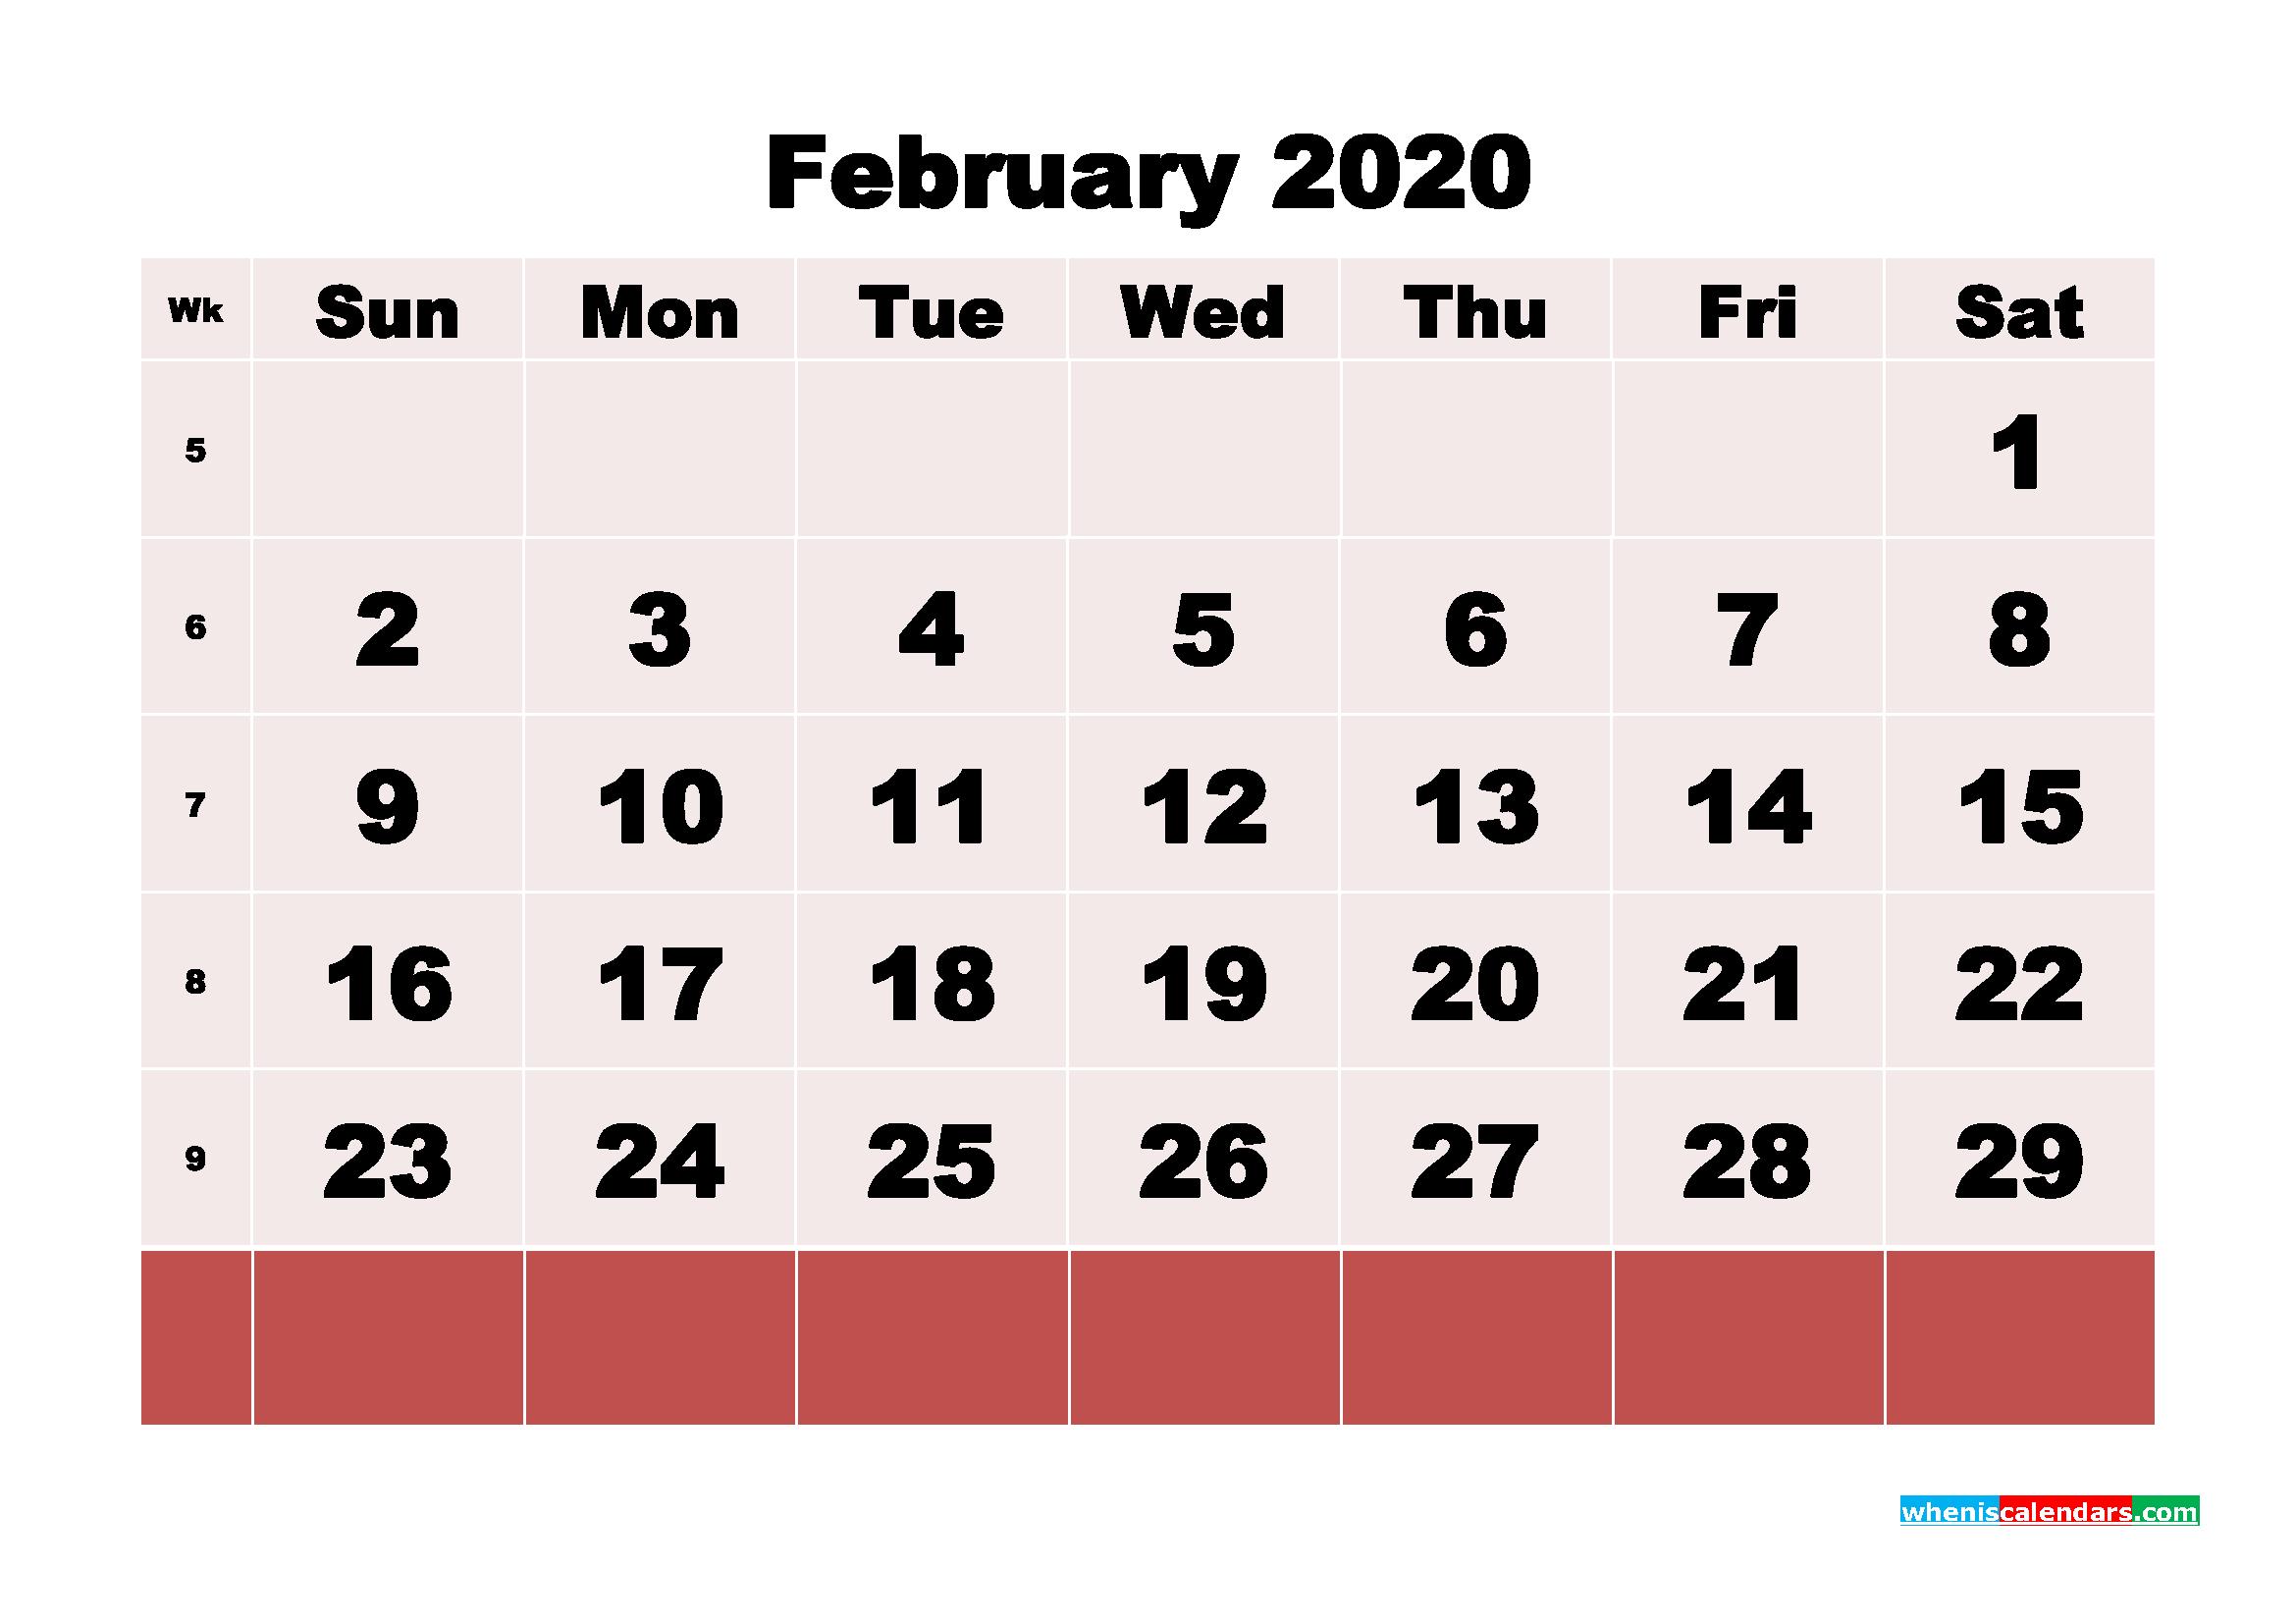 Blank February 2020 Calendar Printable - No.m20b122